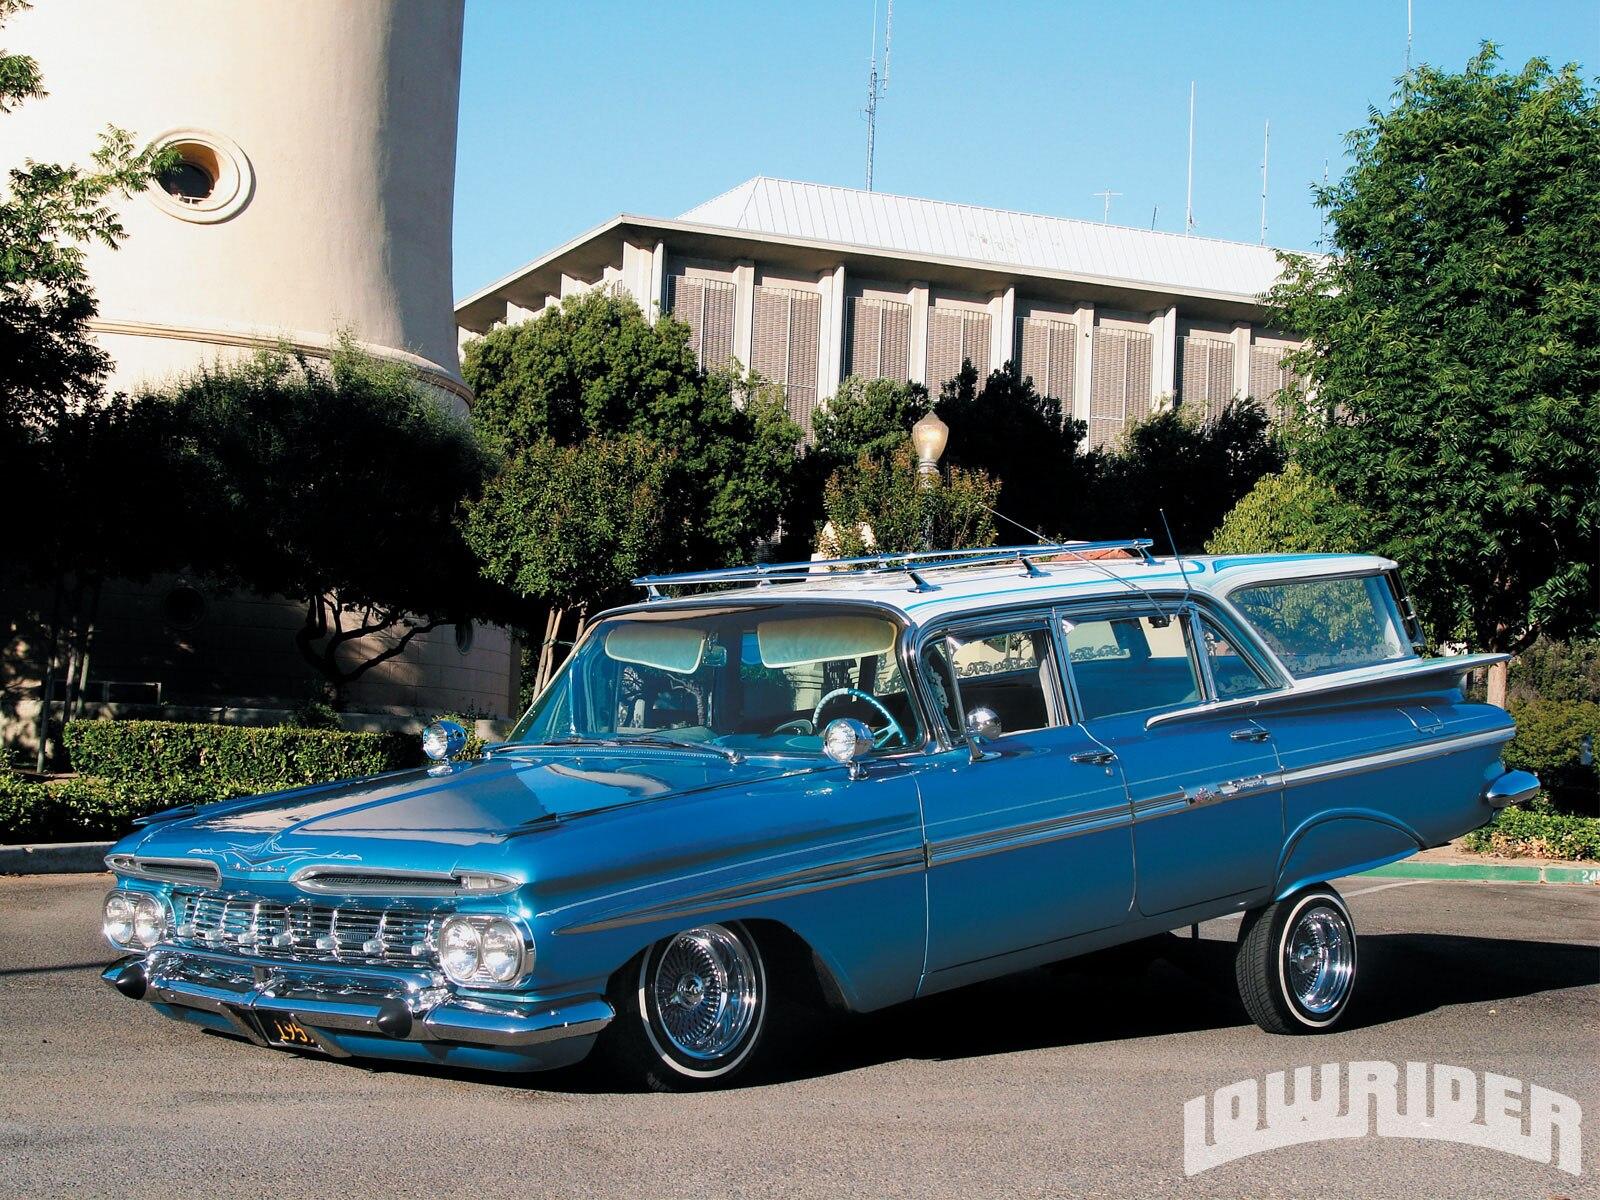 1959 Chevrolet Nomad Wagon - Lowrider Magazine